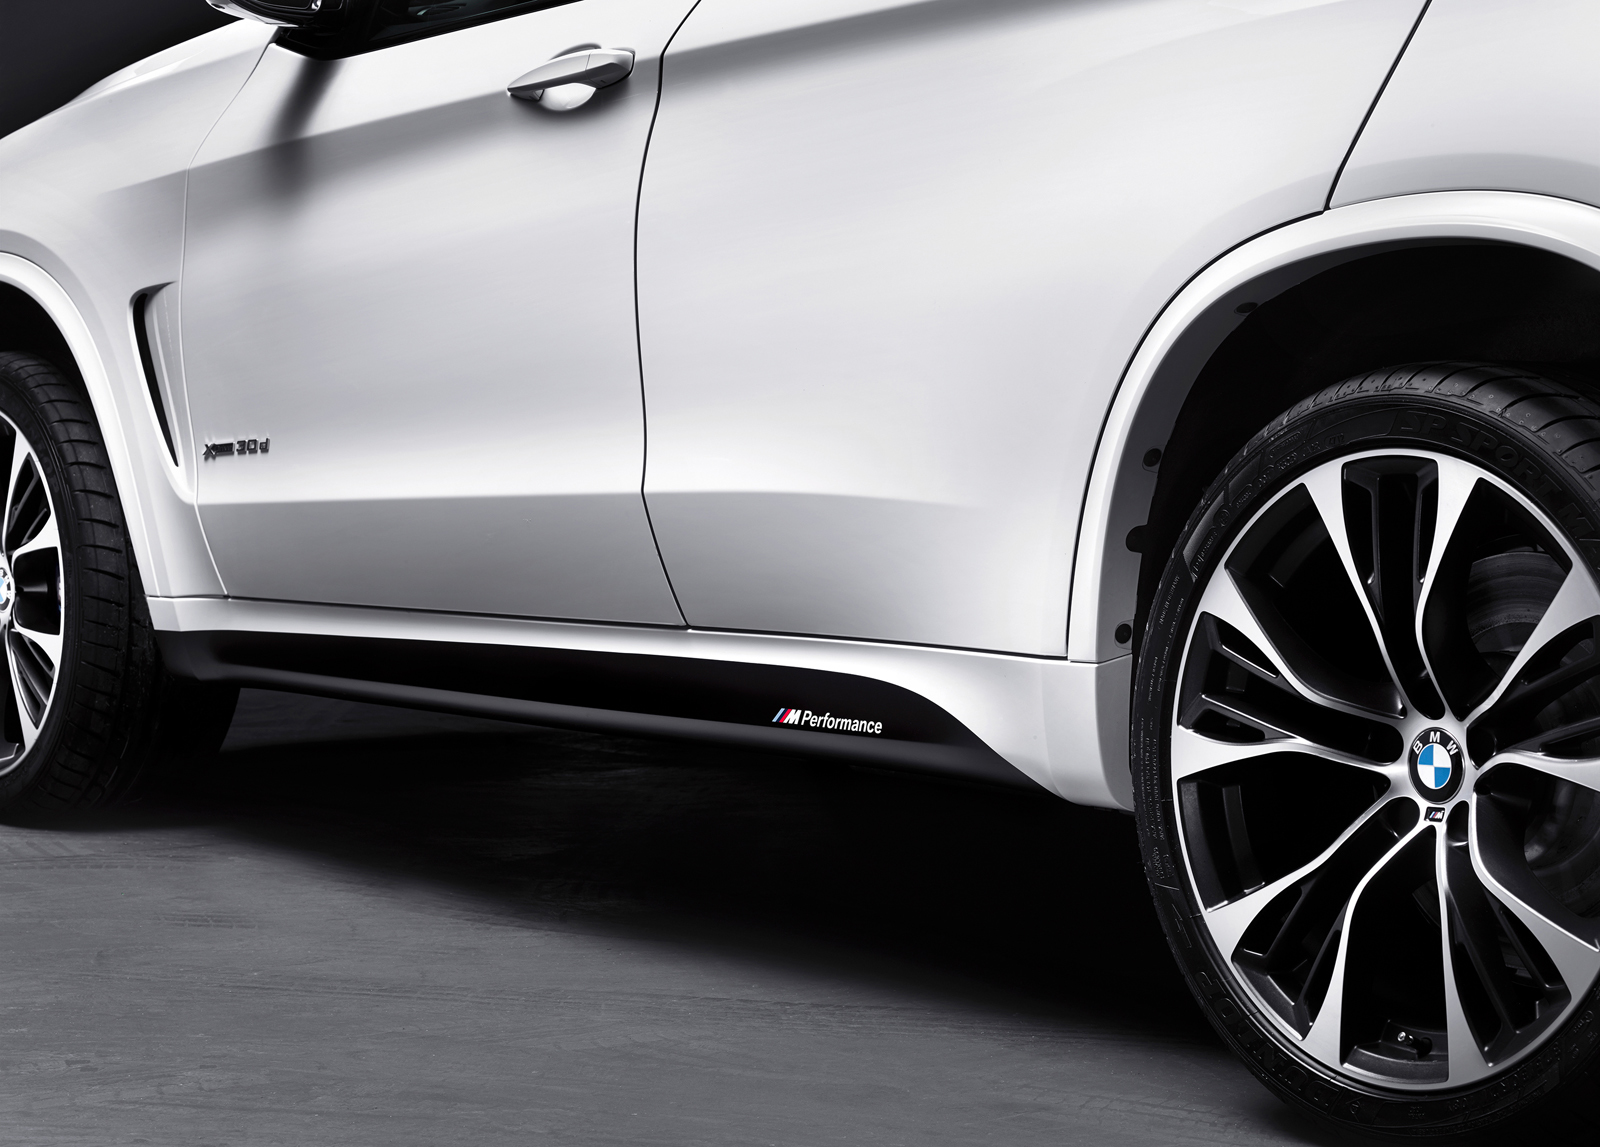 Foto de BMW X5 M Performance (8/11)